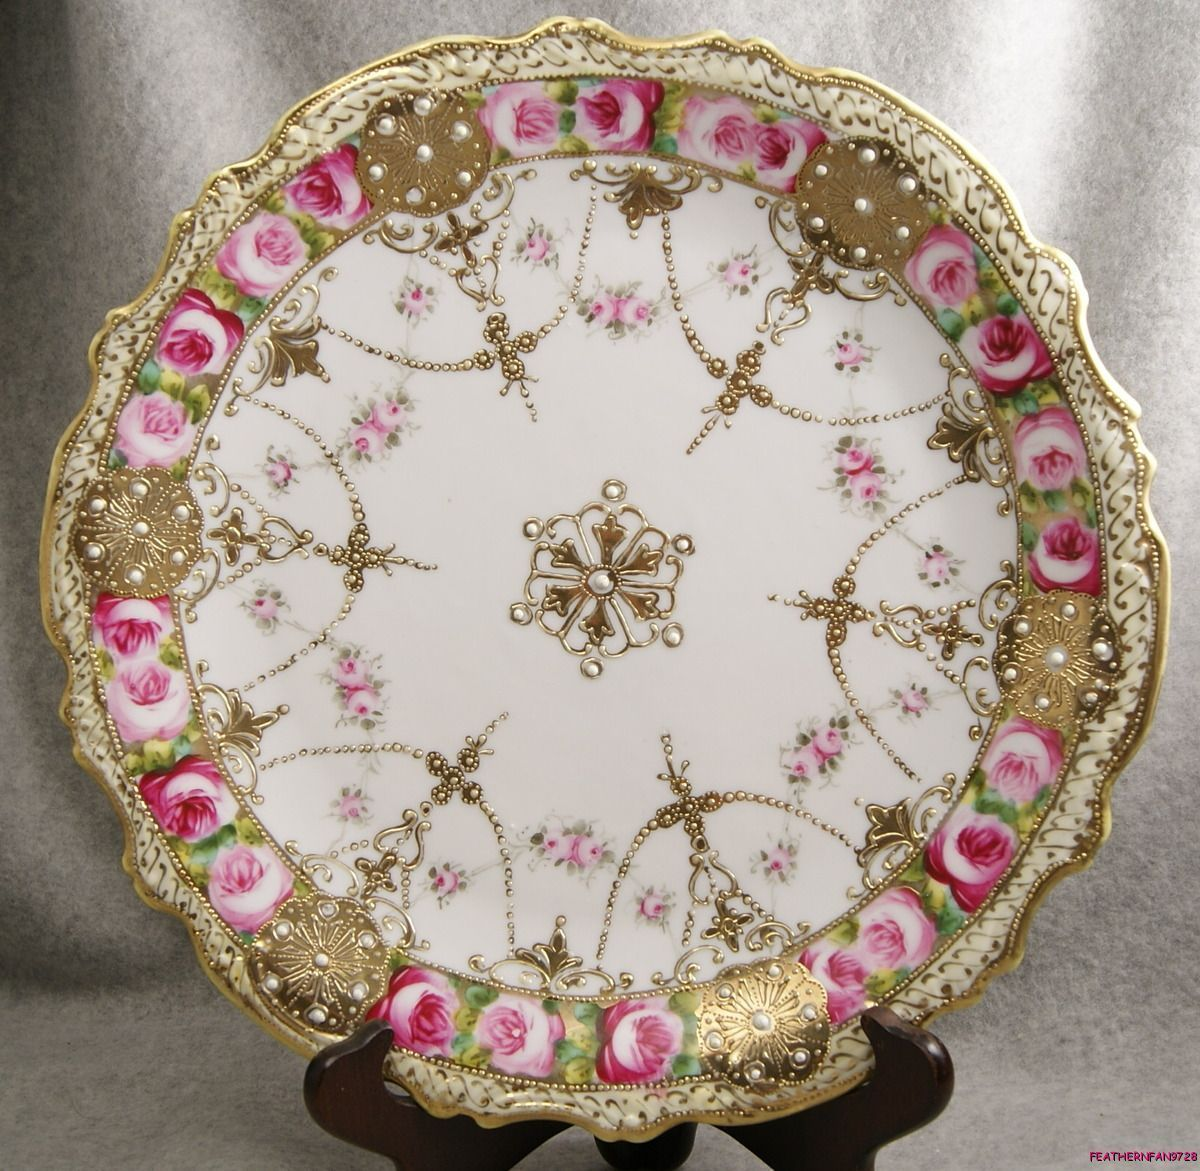 Royal Crockery Noritake Nippon Plate Gold Encrusted Gilt